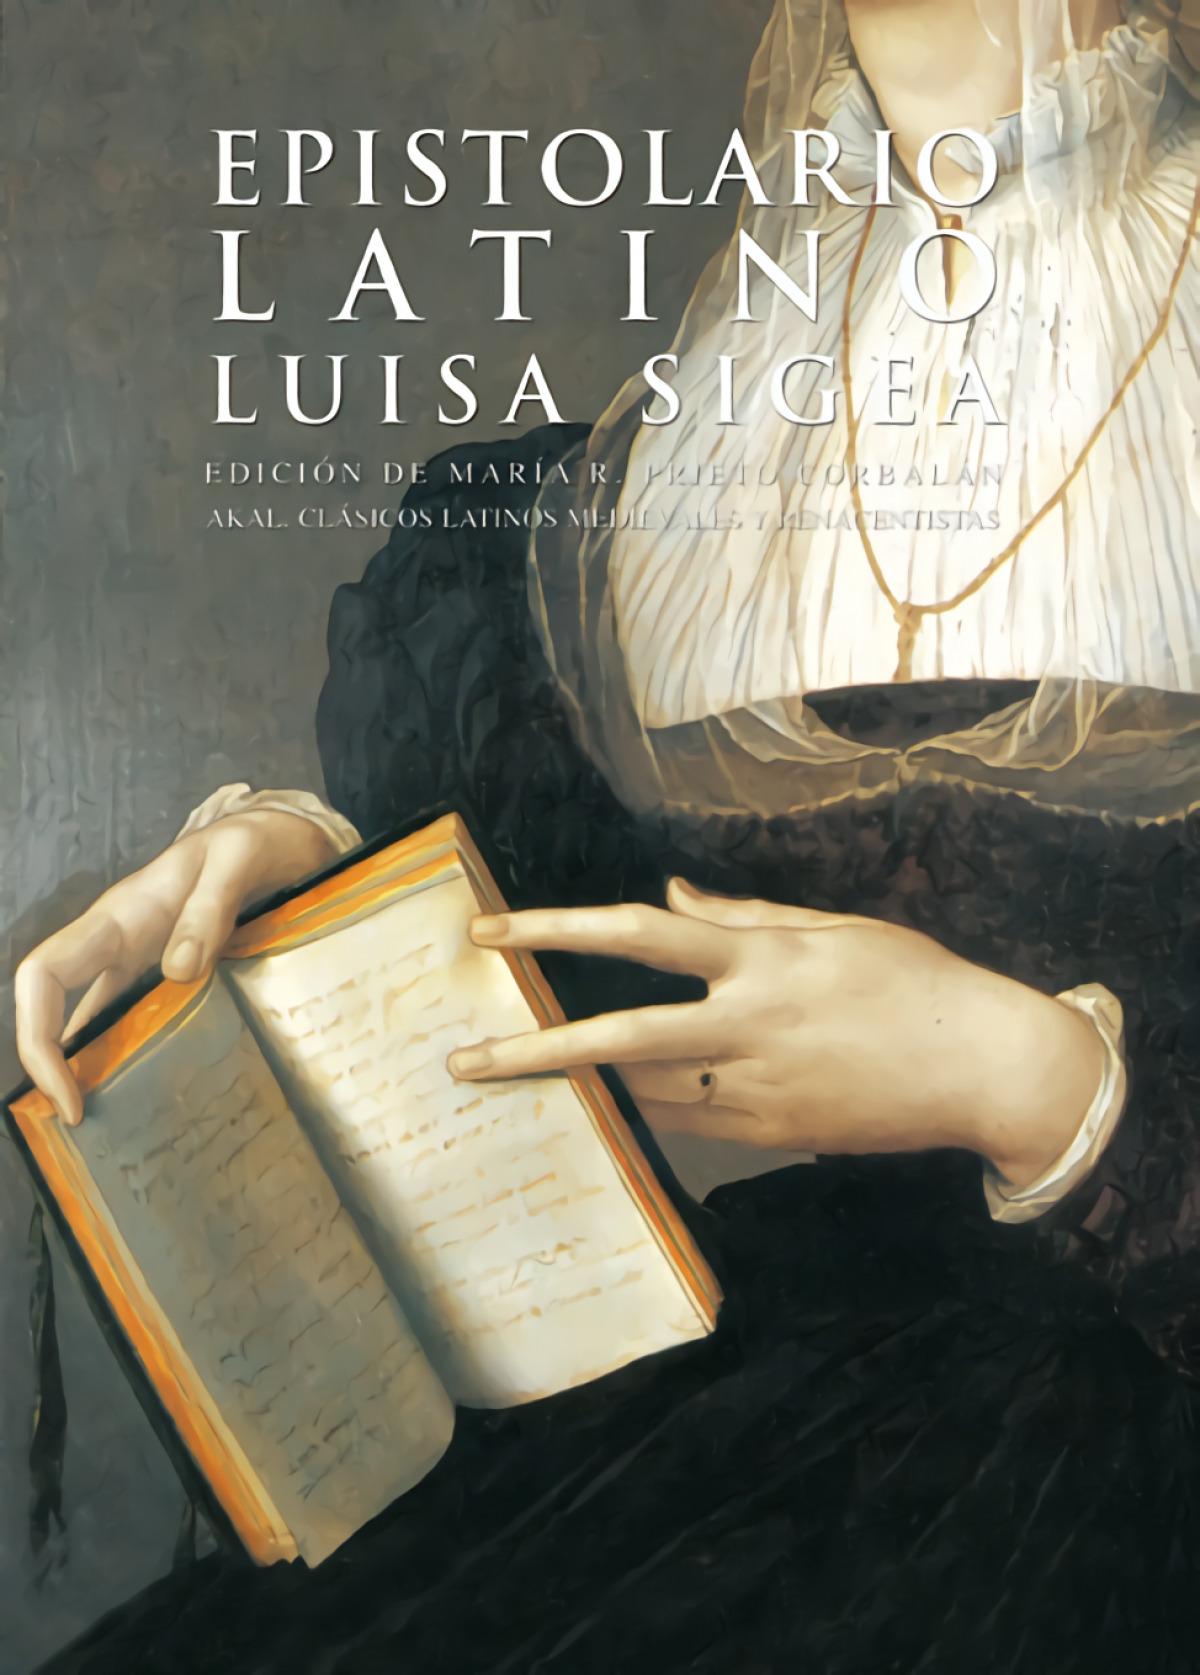 Epistolario latino - Sigea, Luisa